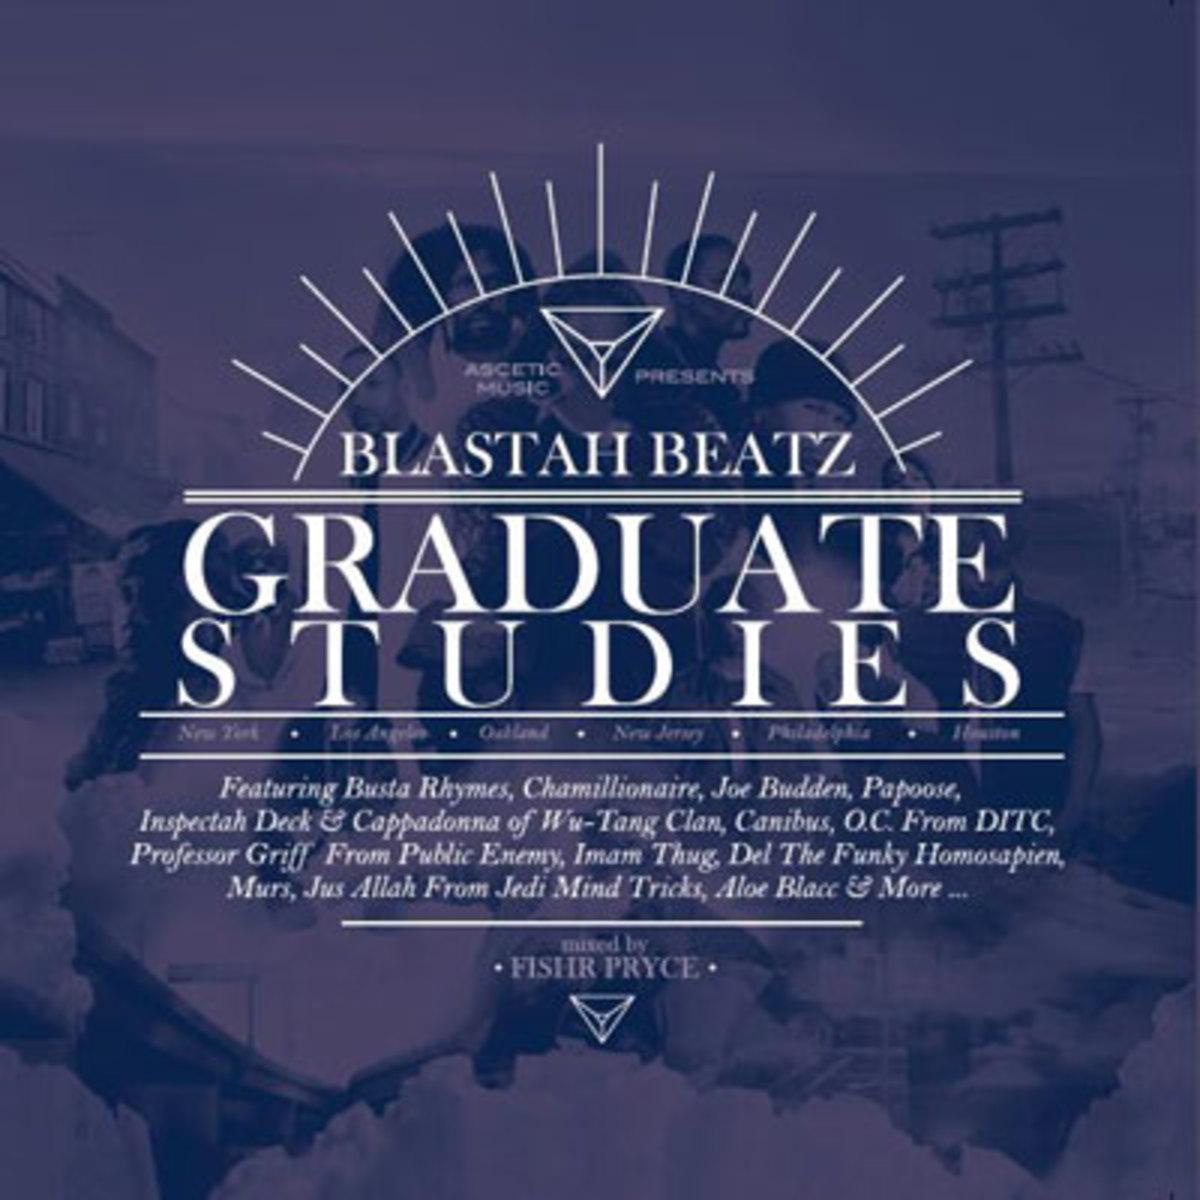 blastahbeatz-graduatestudies.jpg